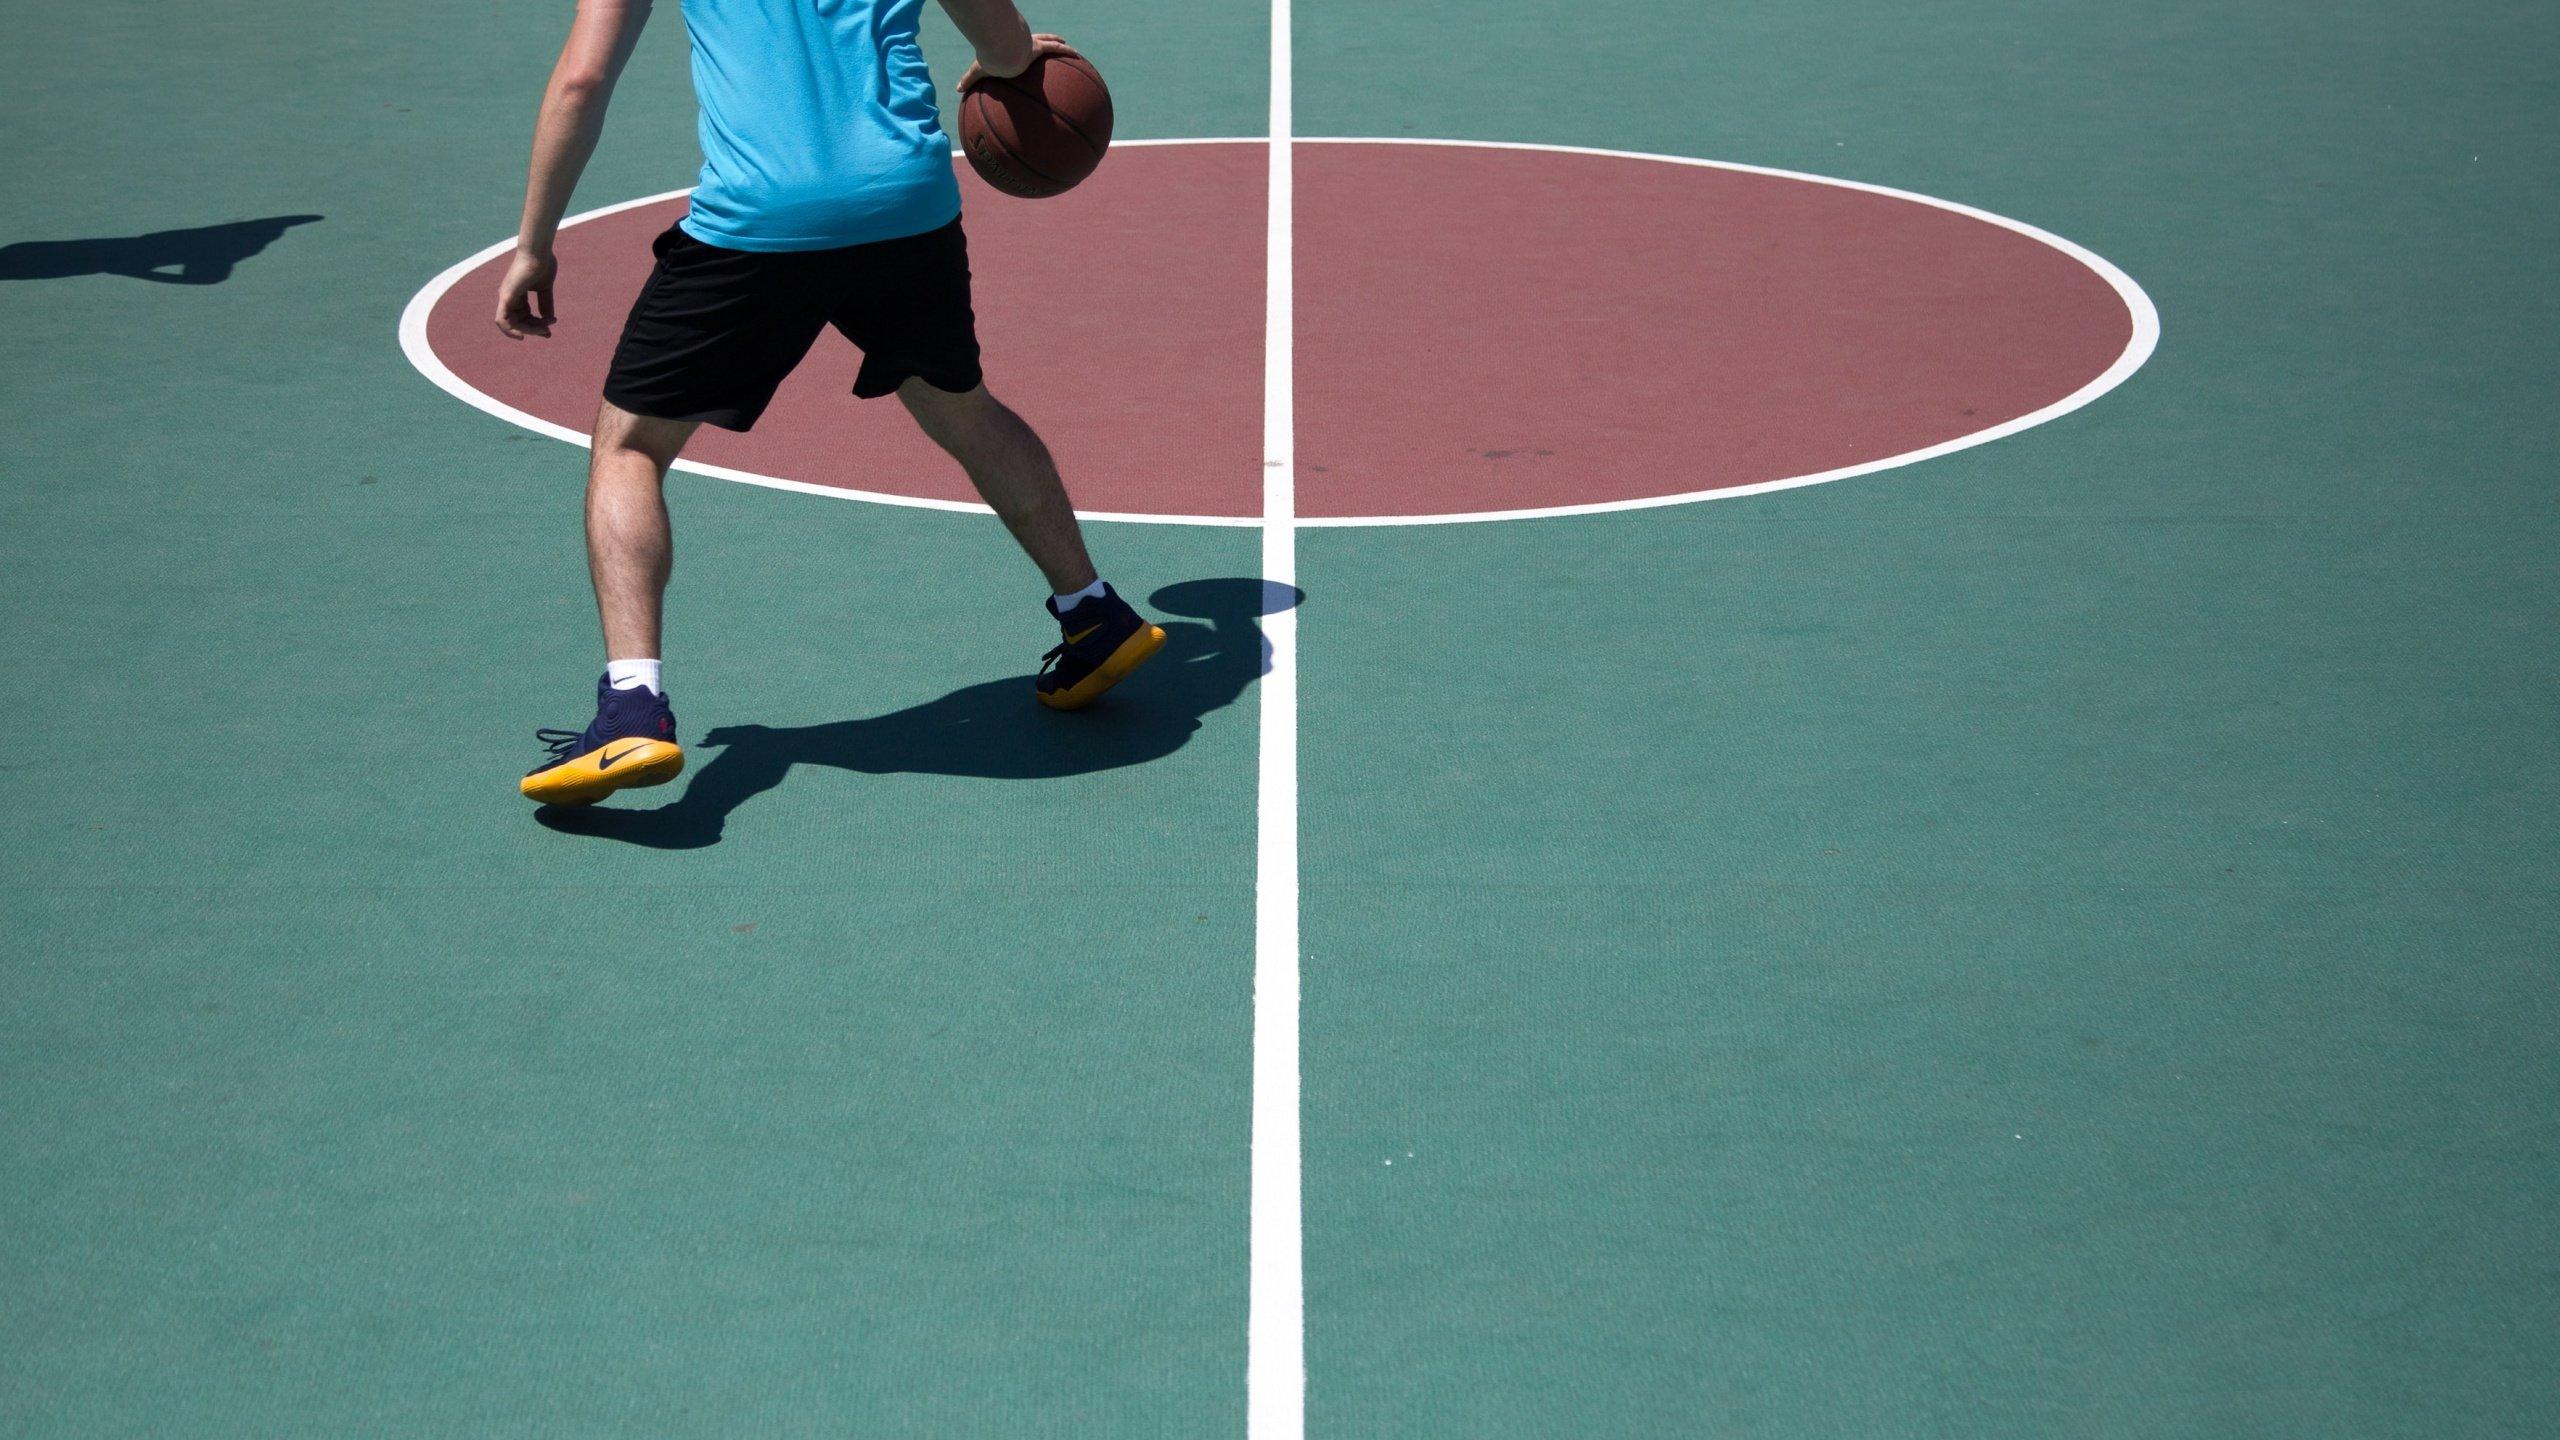 deporte rendimiento baloncesto